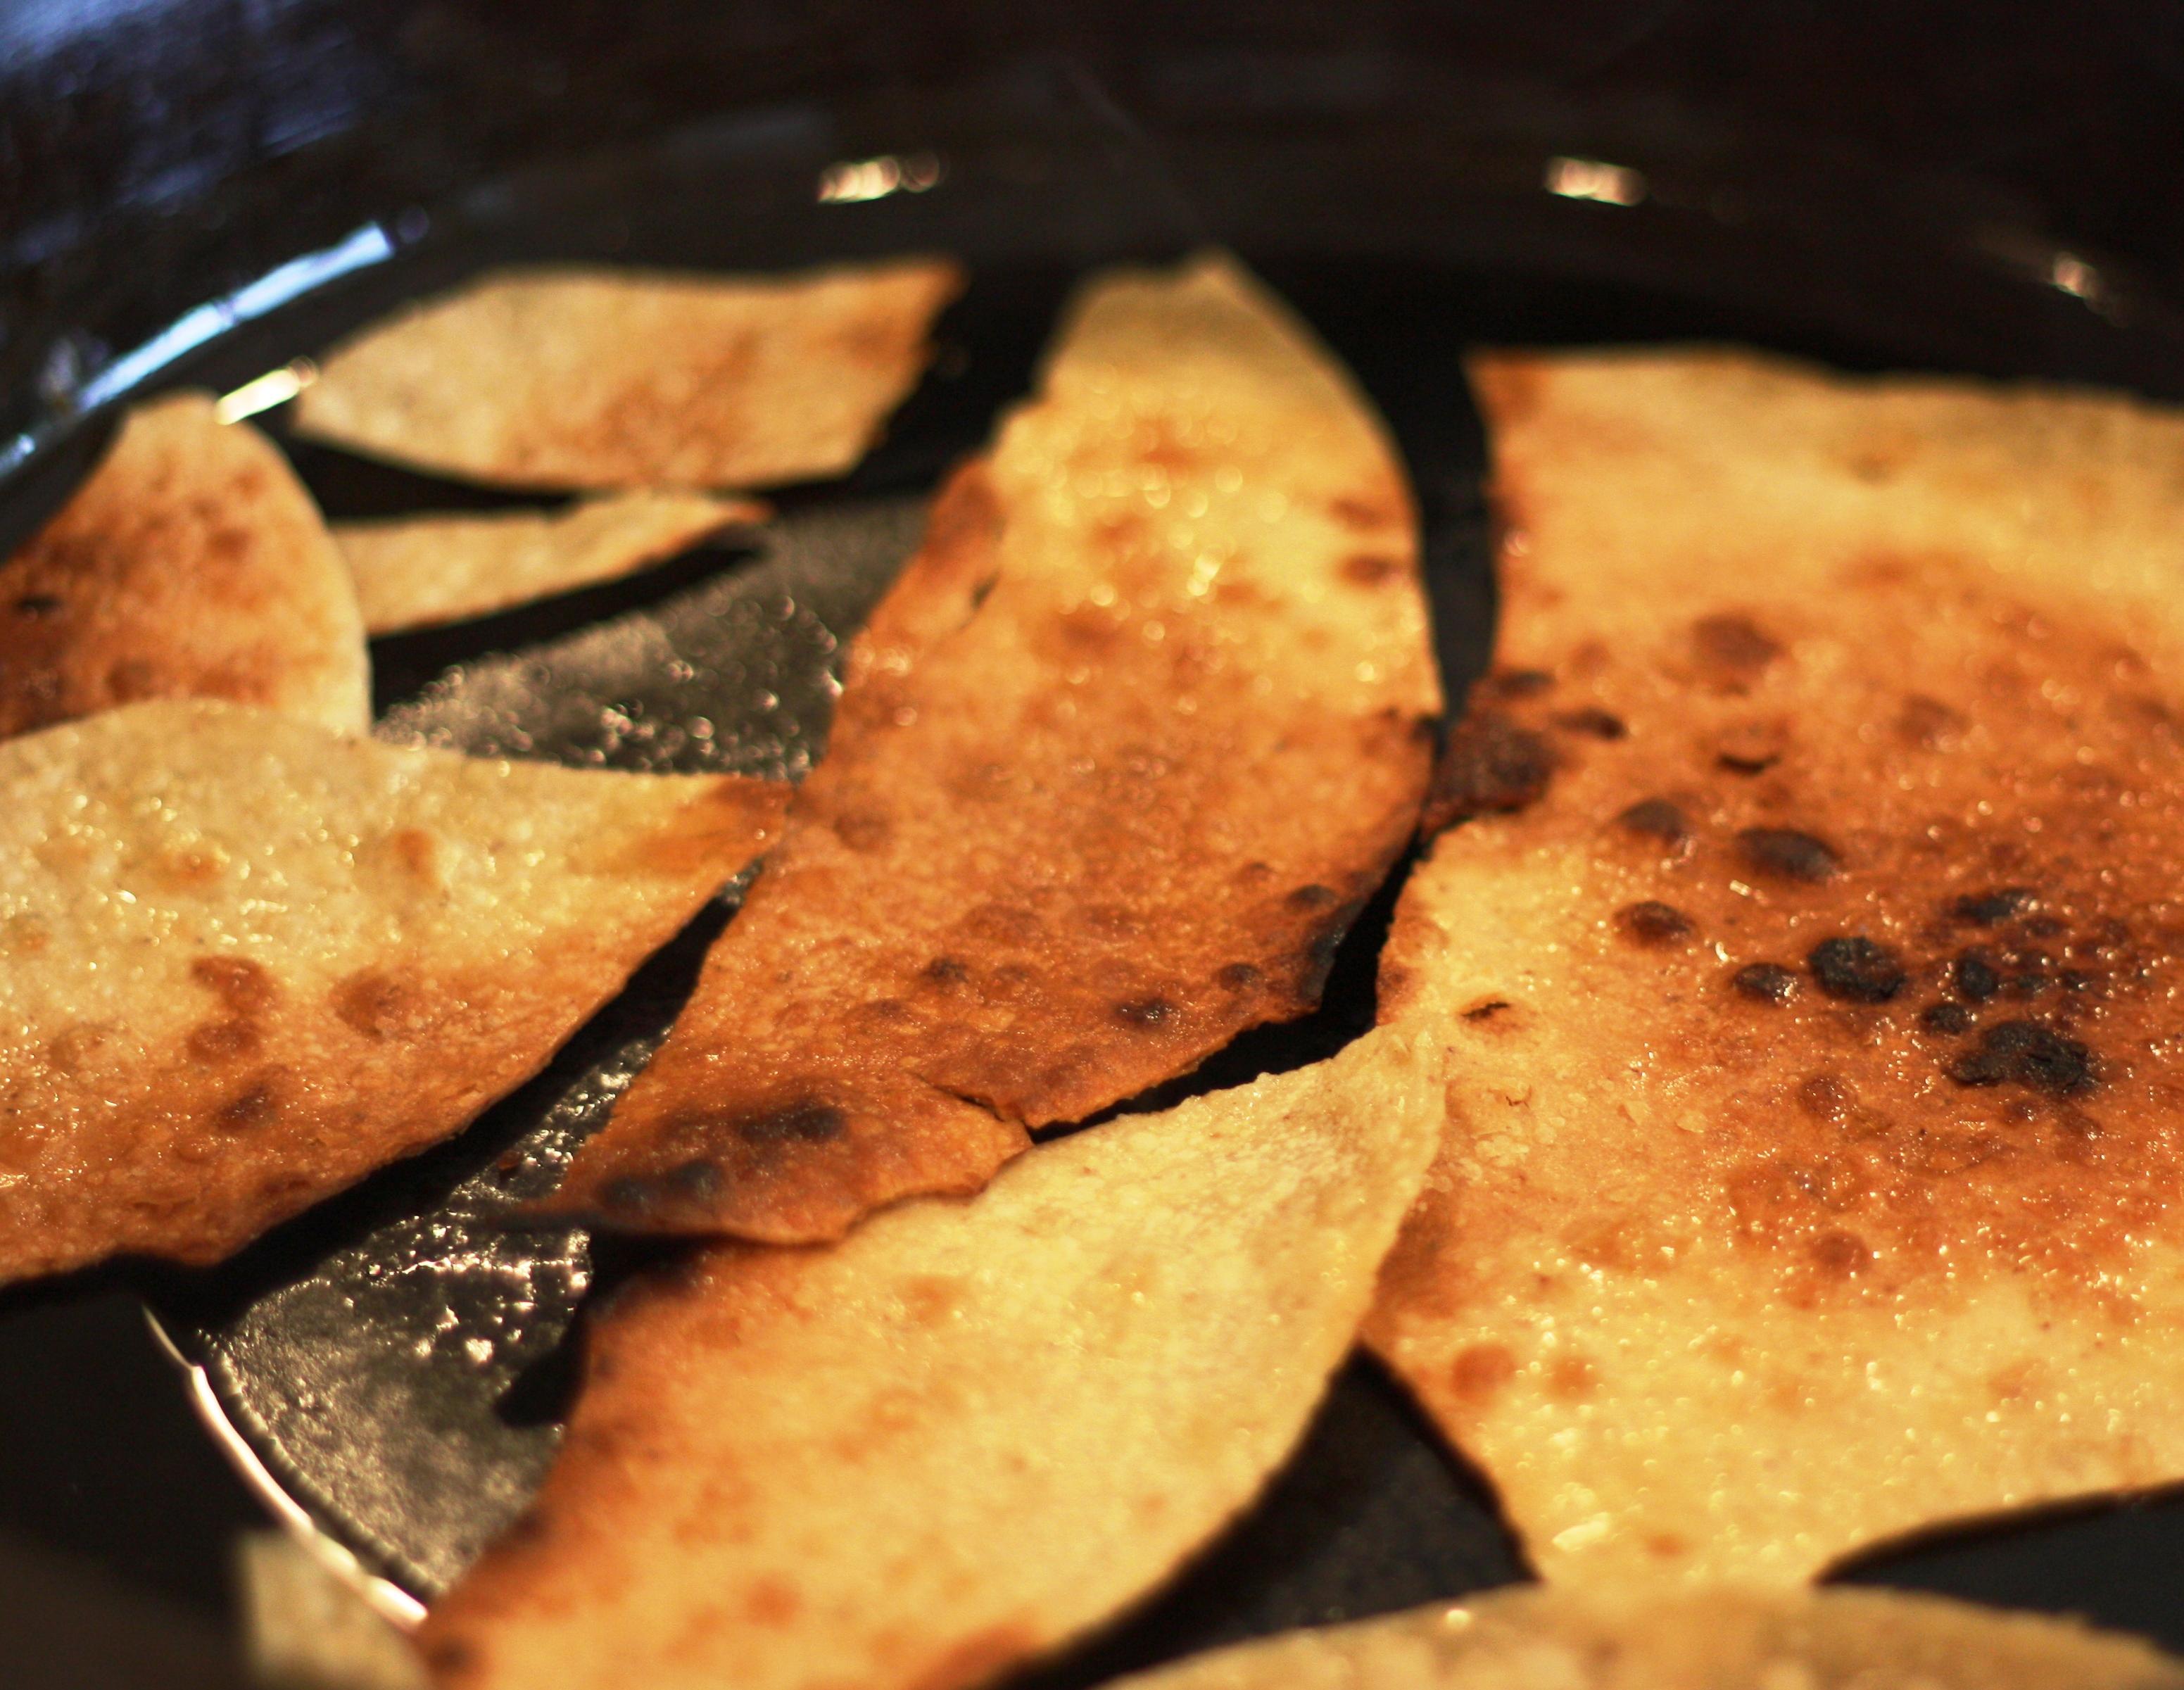 free chips crackers garcia gluten free organic thins tortilla gluten ...